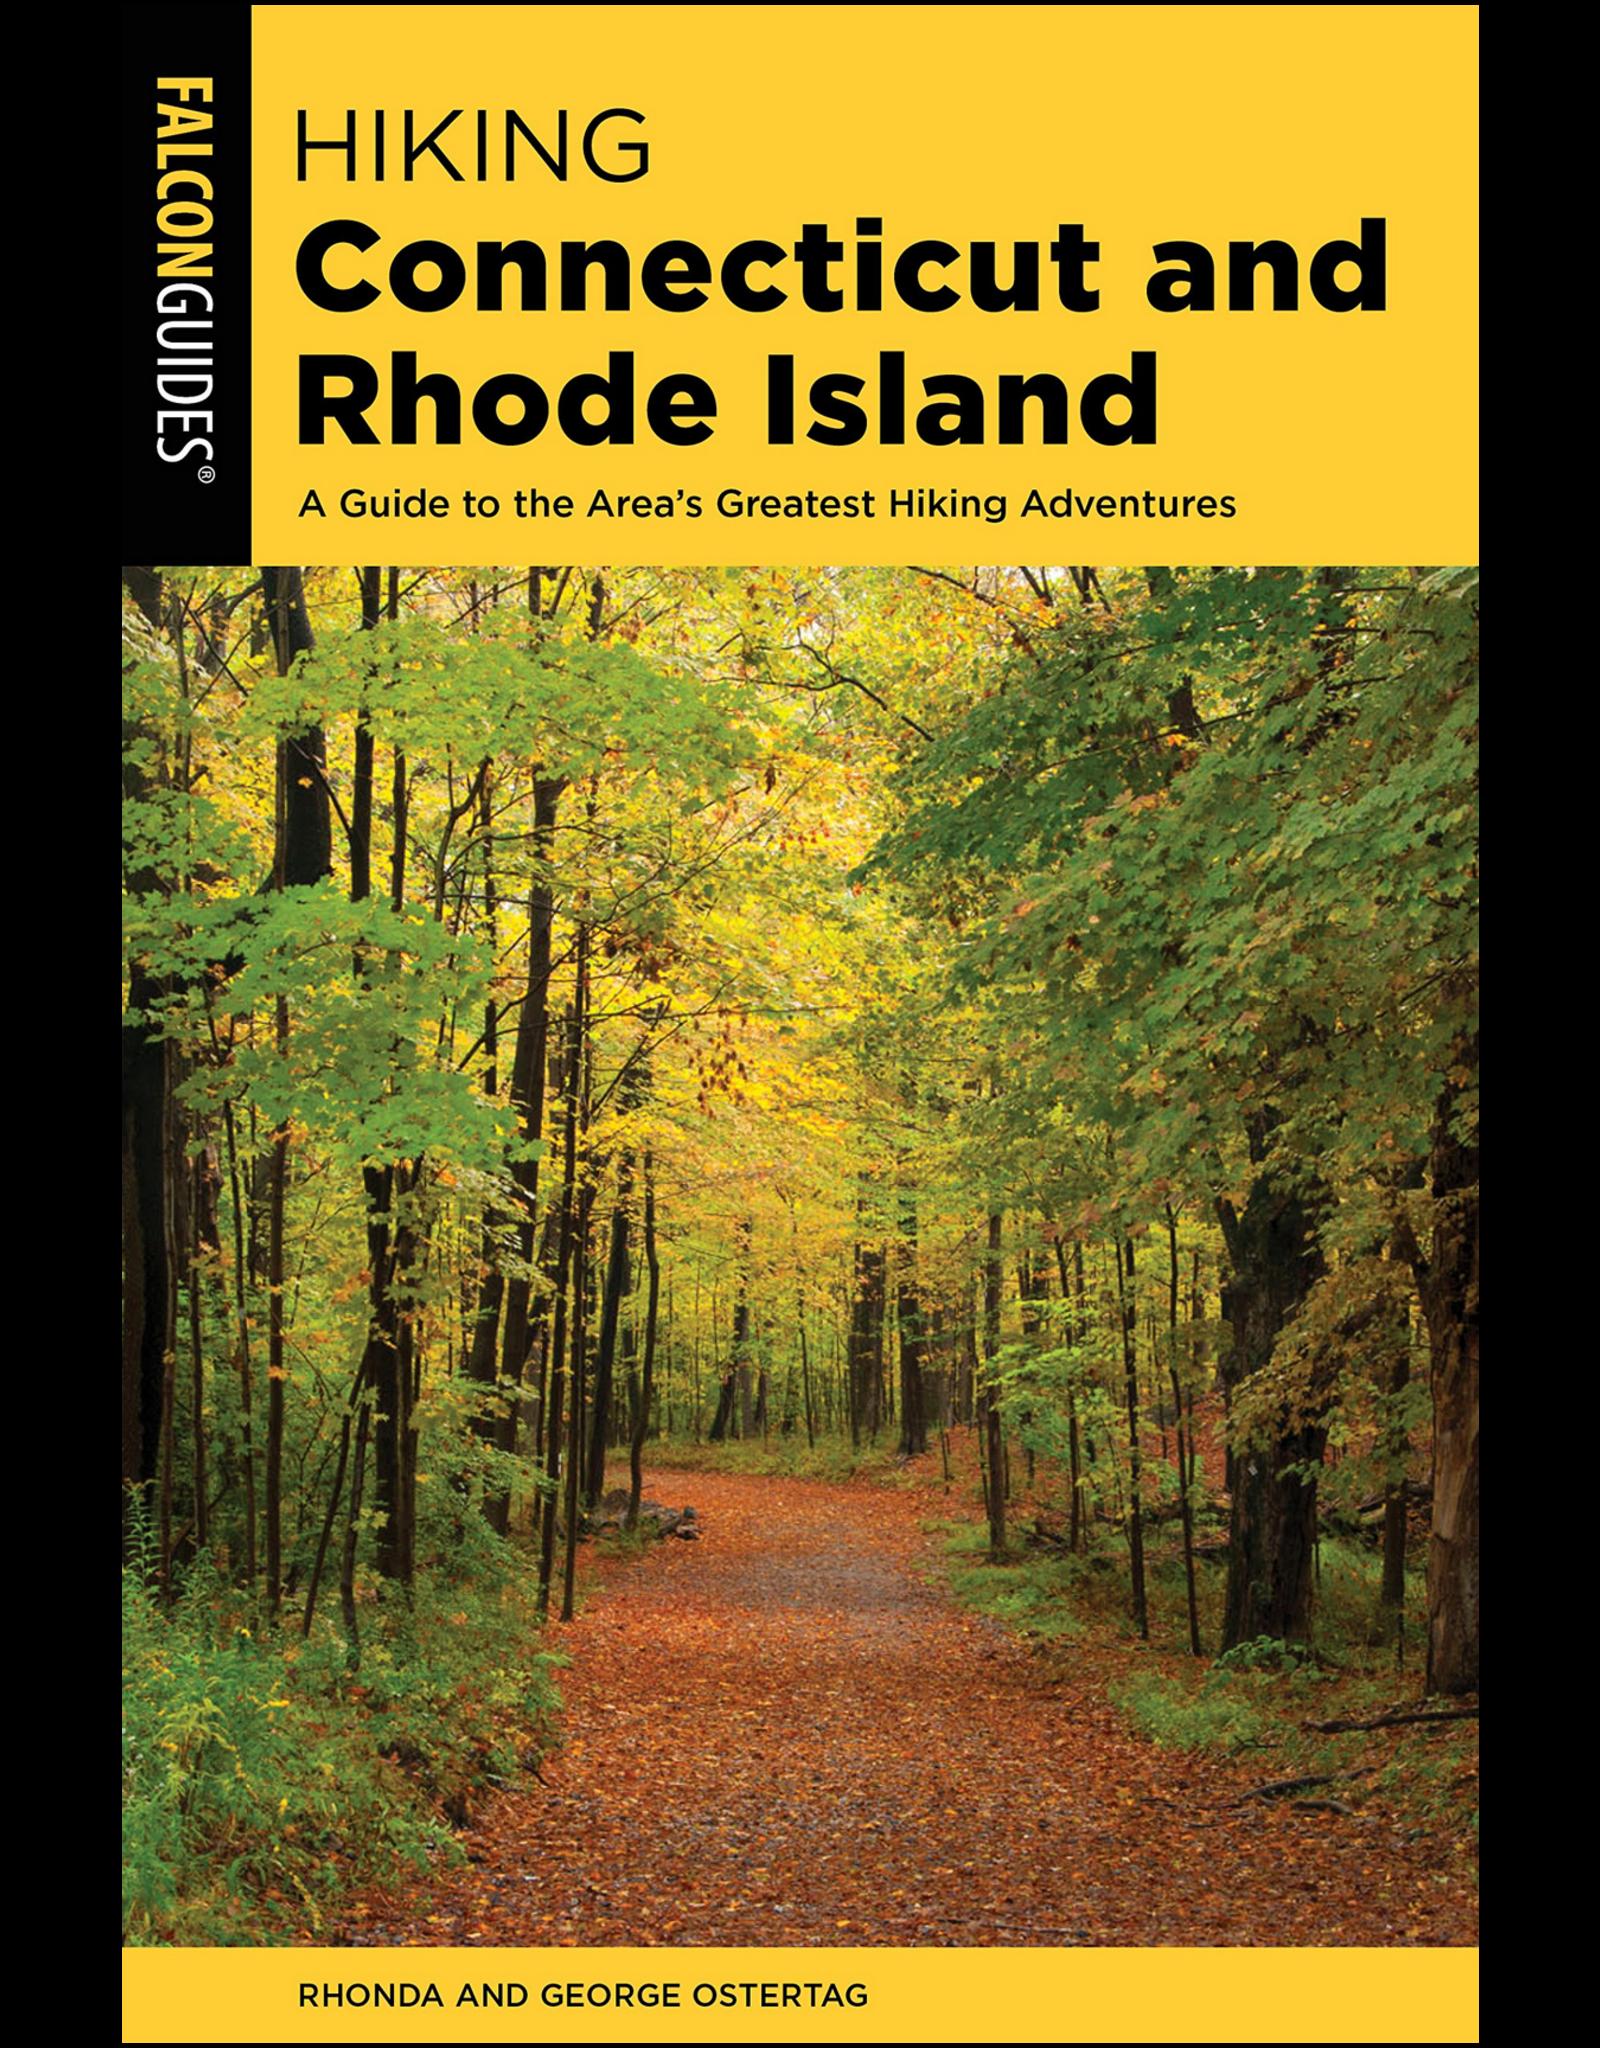 Connecticut & Rhode Island Hiking Guide